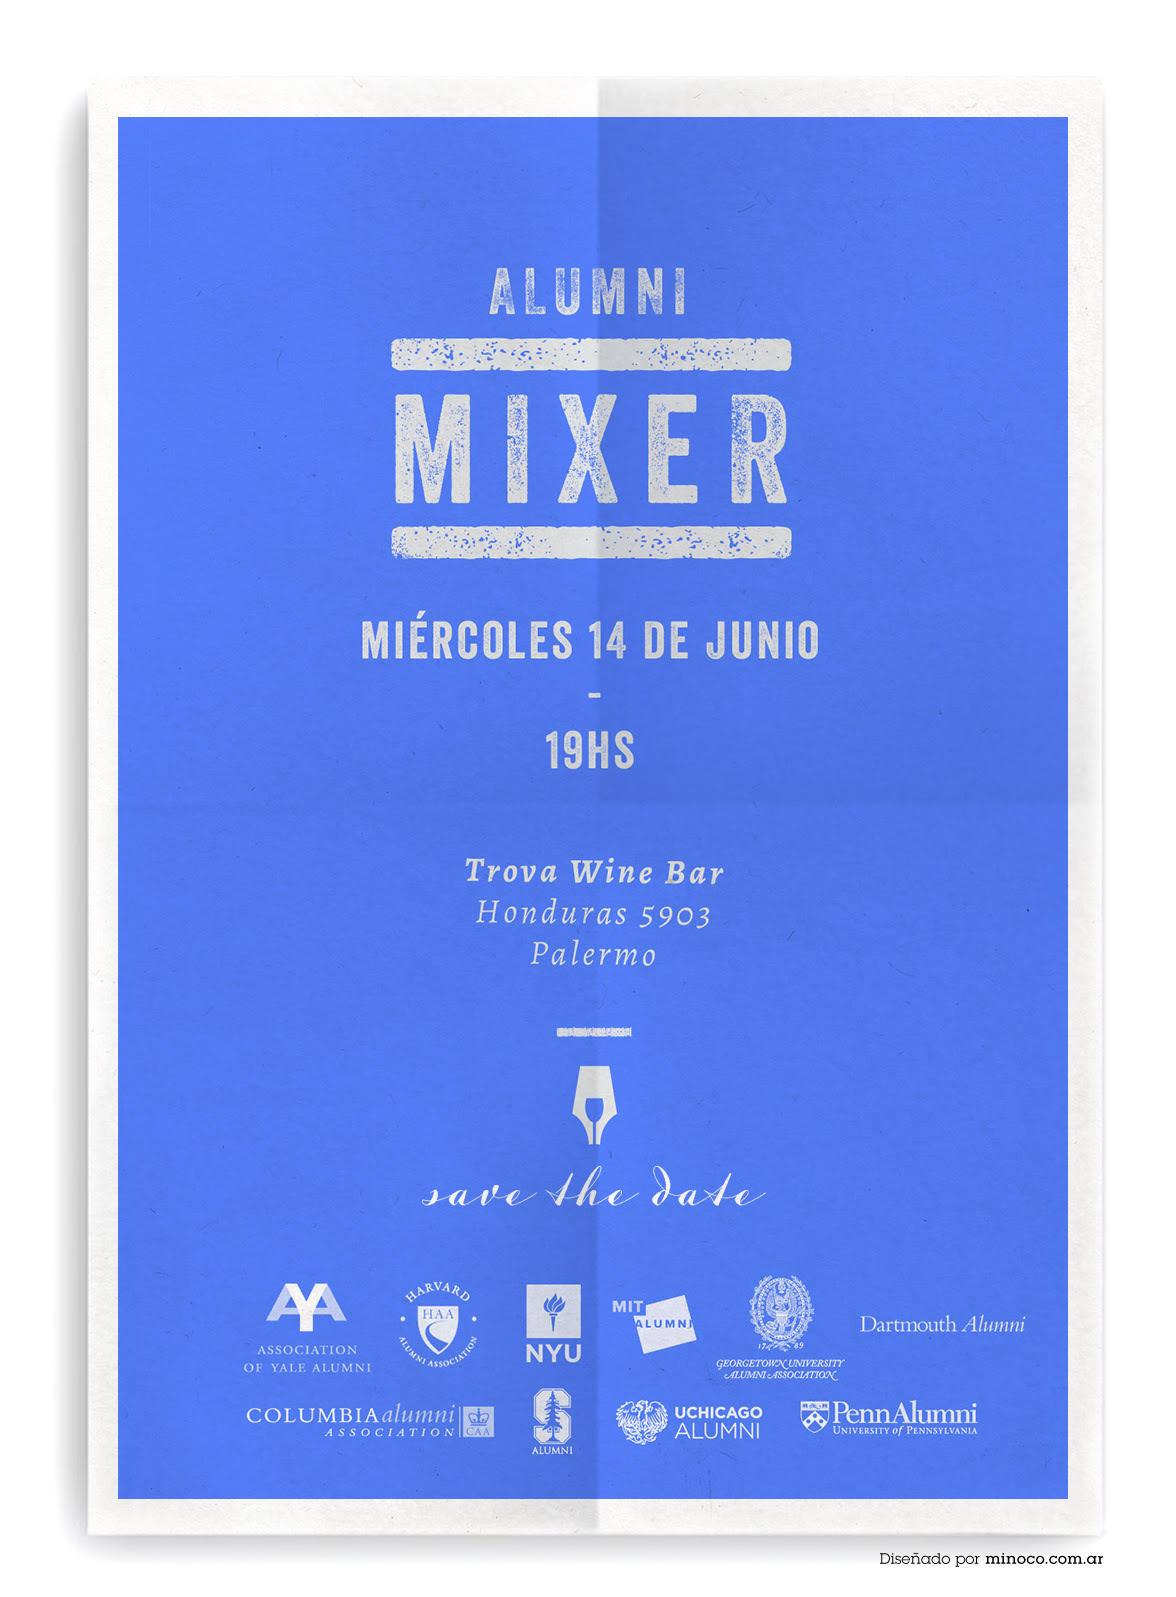 Alumni_Mixer-2012-06-14_Invite.jpg